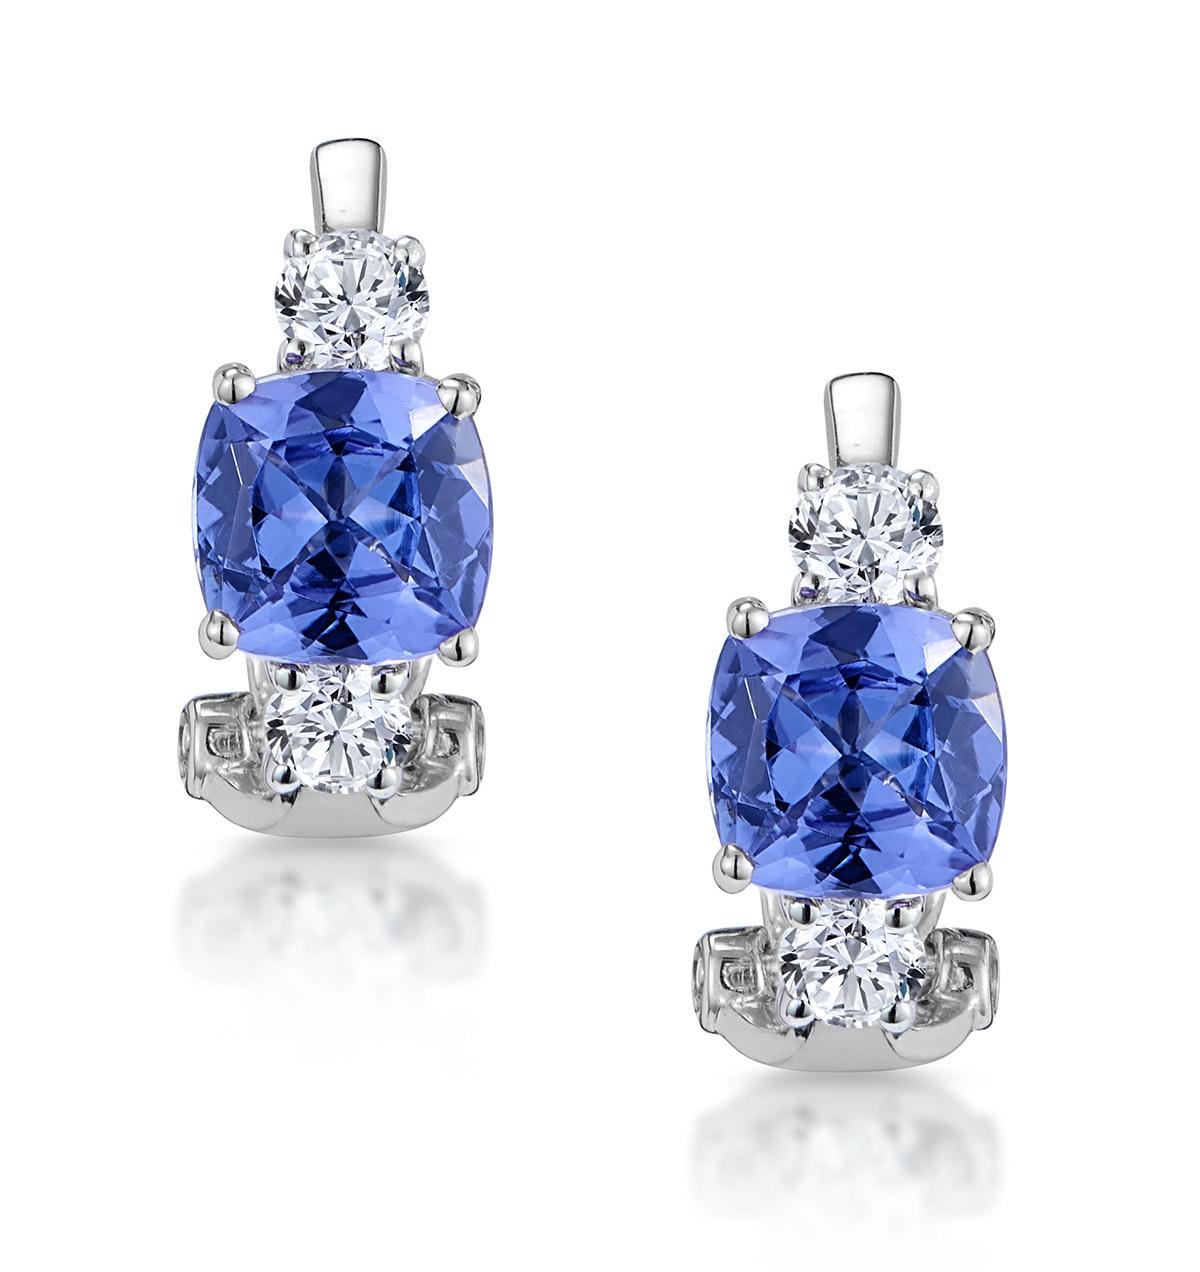 2.20ct Tanzanite Asteria Collection Diamond Earrings 18K White Gold